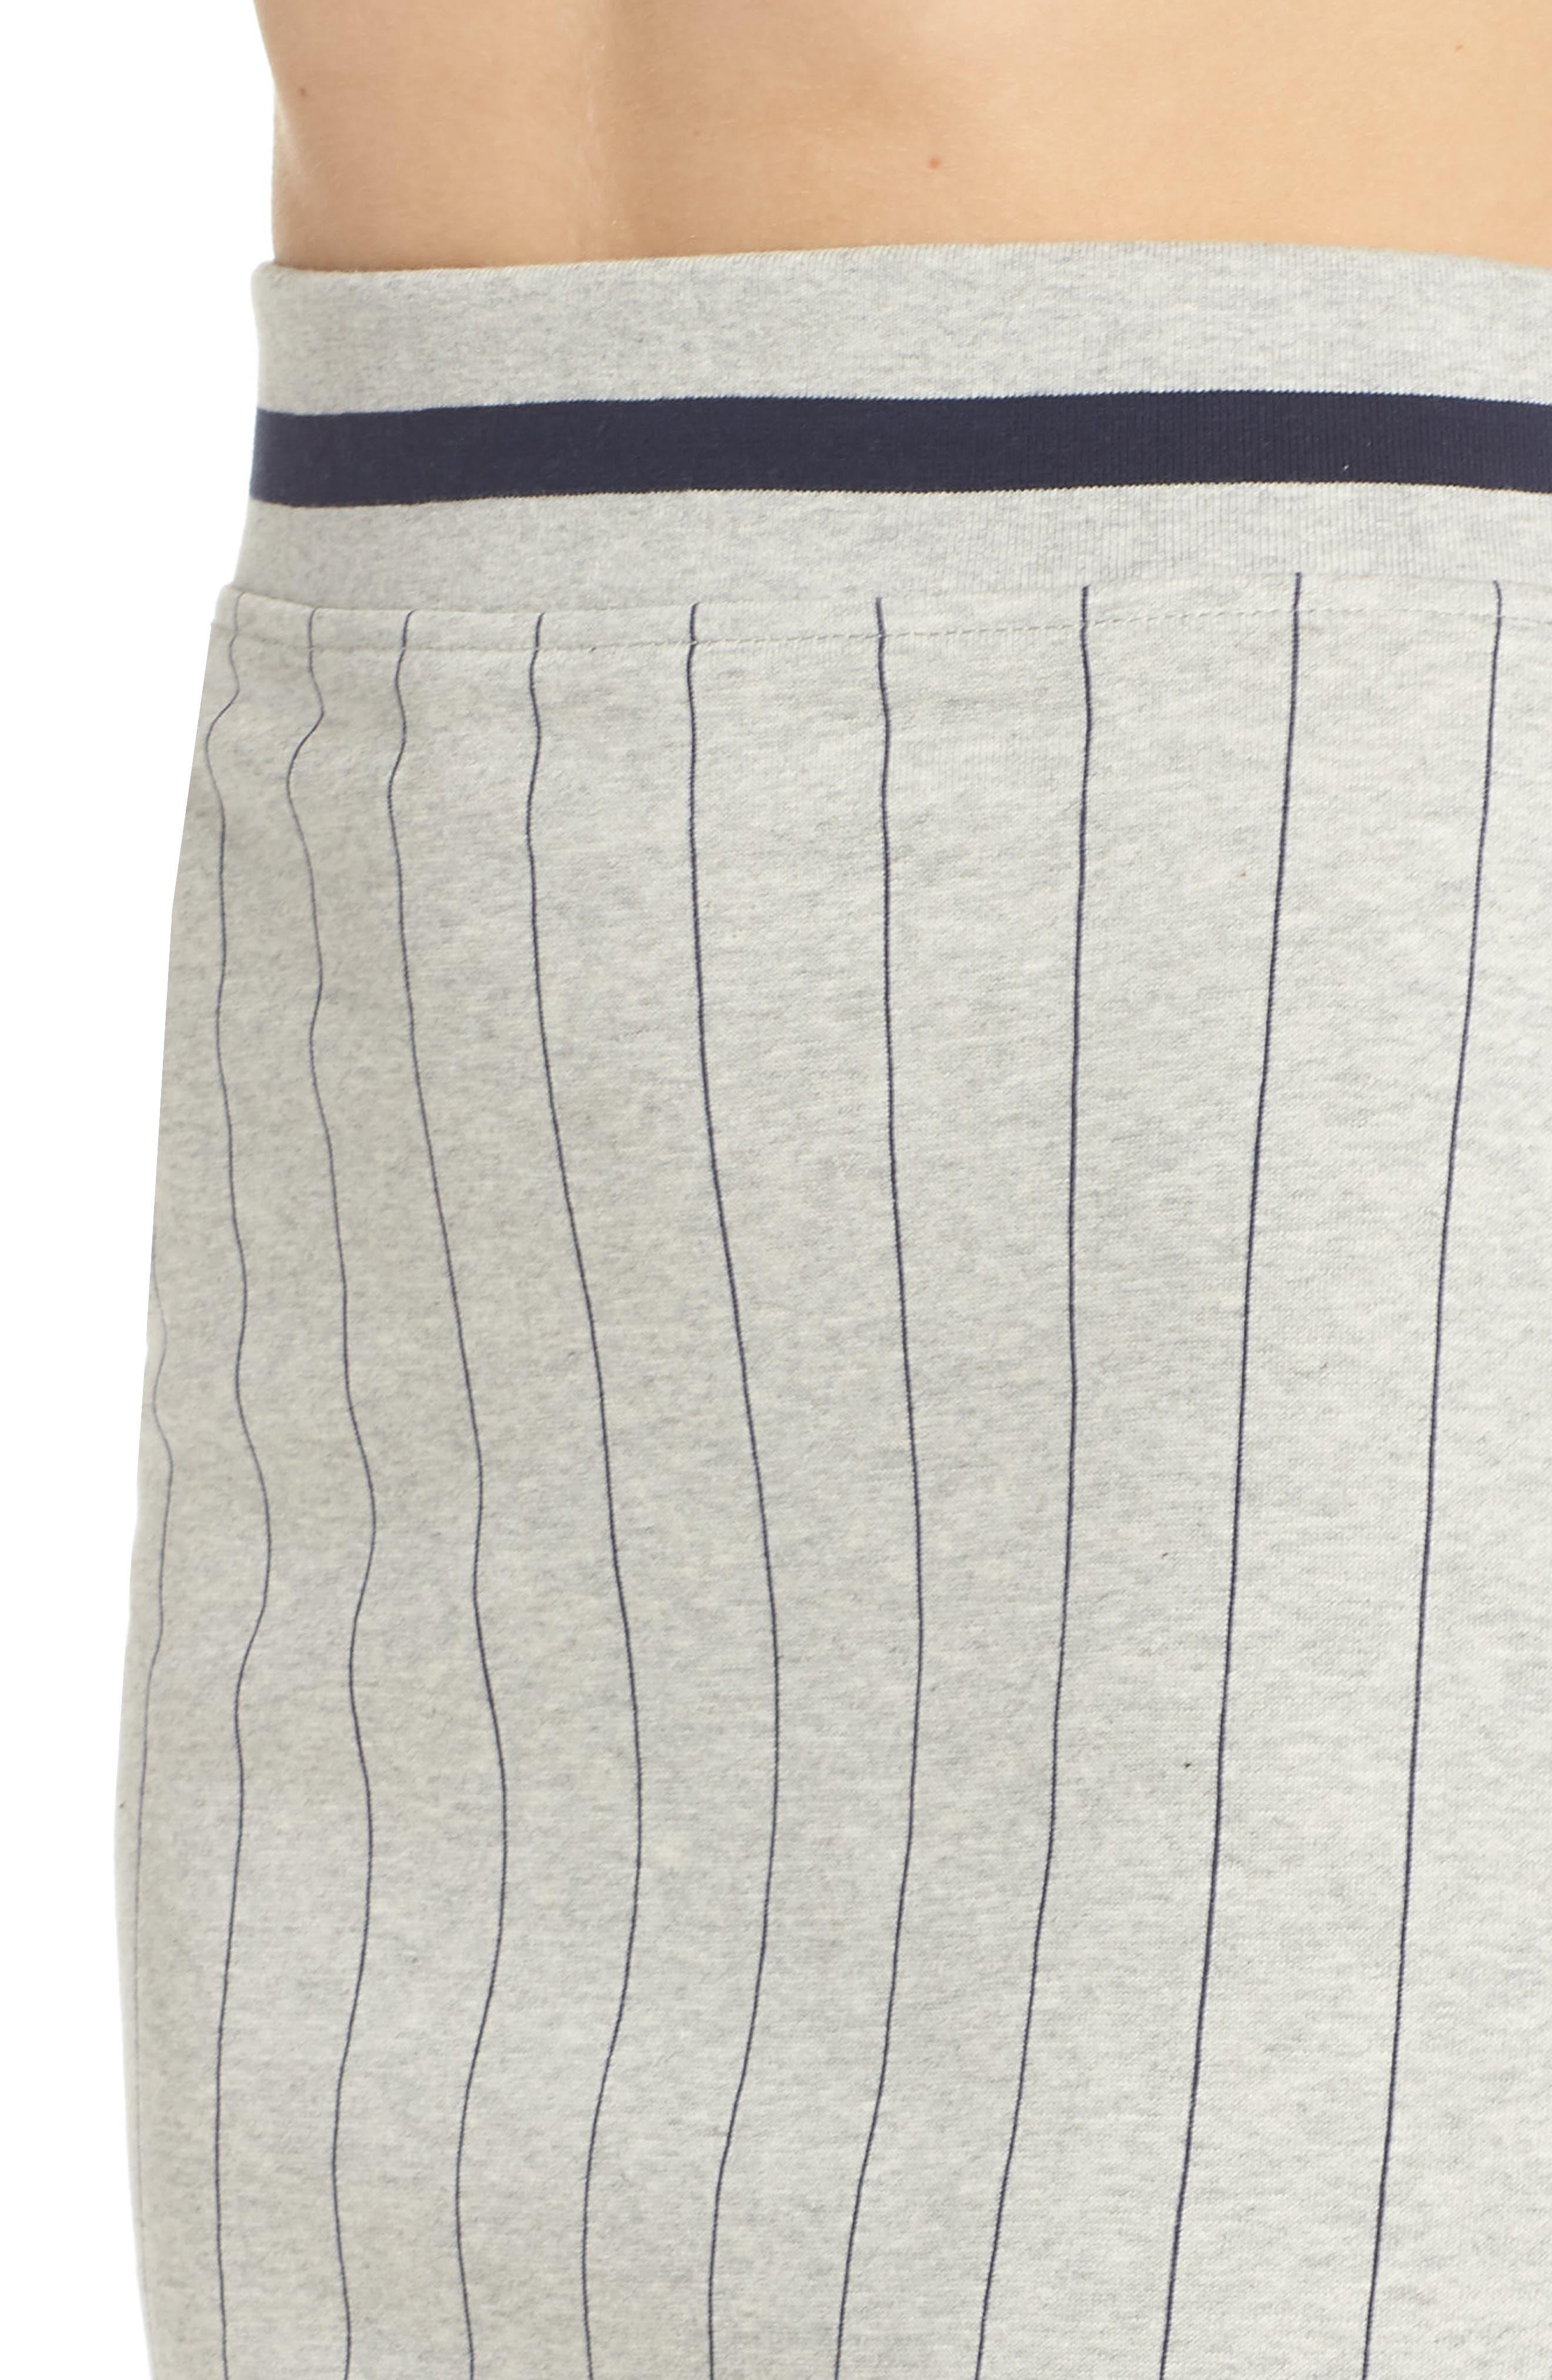 Francesca Pinstripe Skirt,                             Alternate thumbnail 6, color,                             Light Grey Marl/ Peacoat